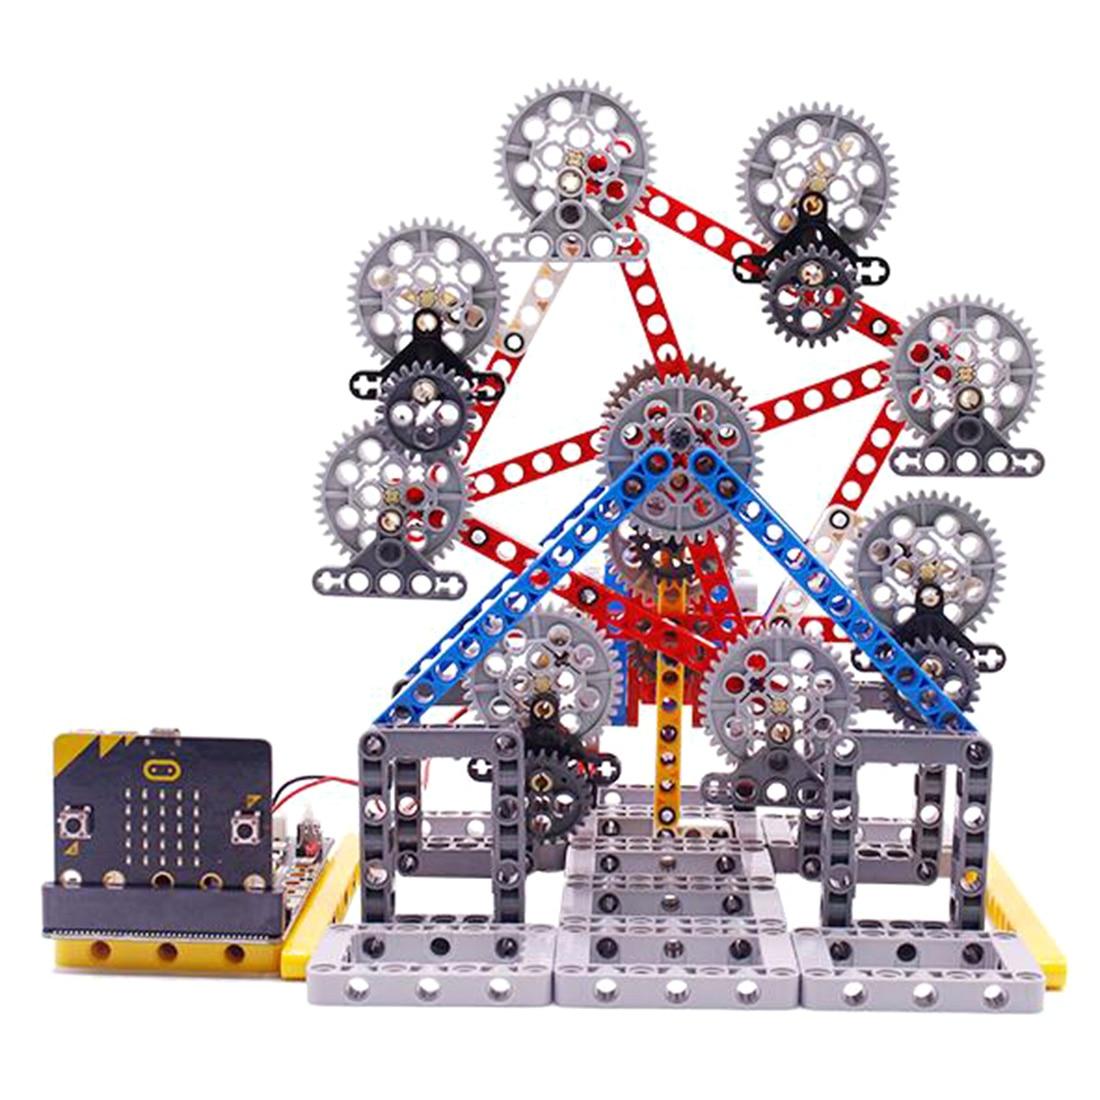 Hot Micro:Bit Programmable Building Block DIY Smart Ferris Wheel Kit Learning Kit Programmable Dancing Robot Kits Electronic Toy